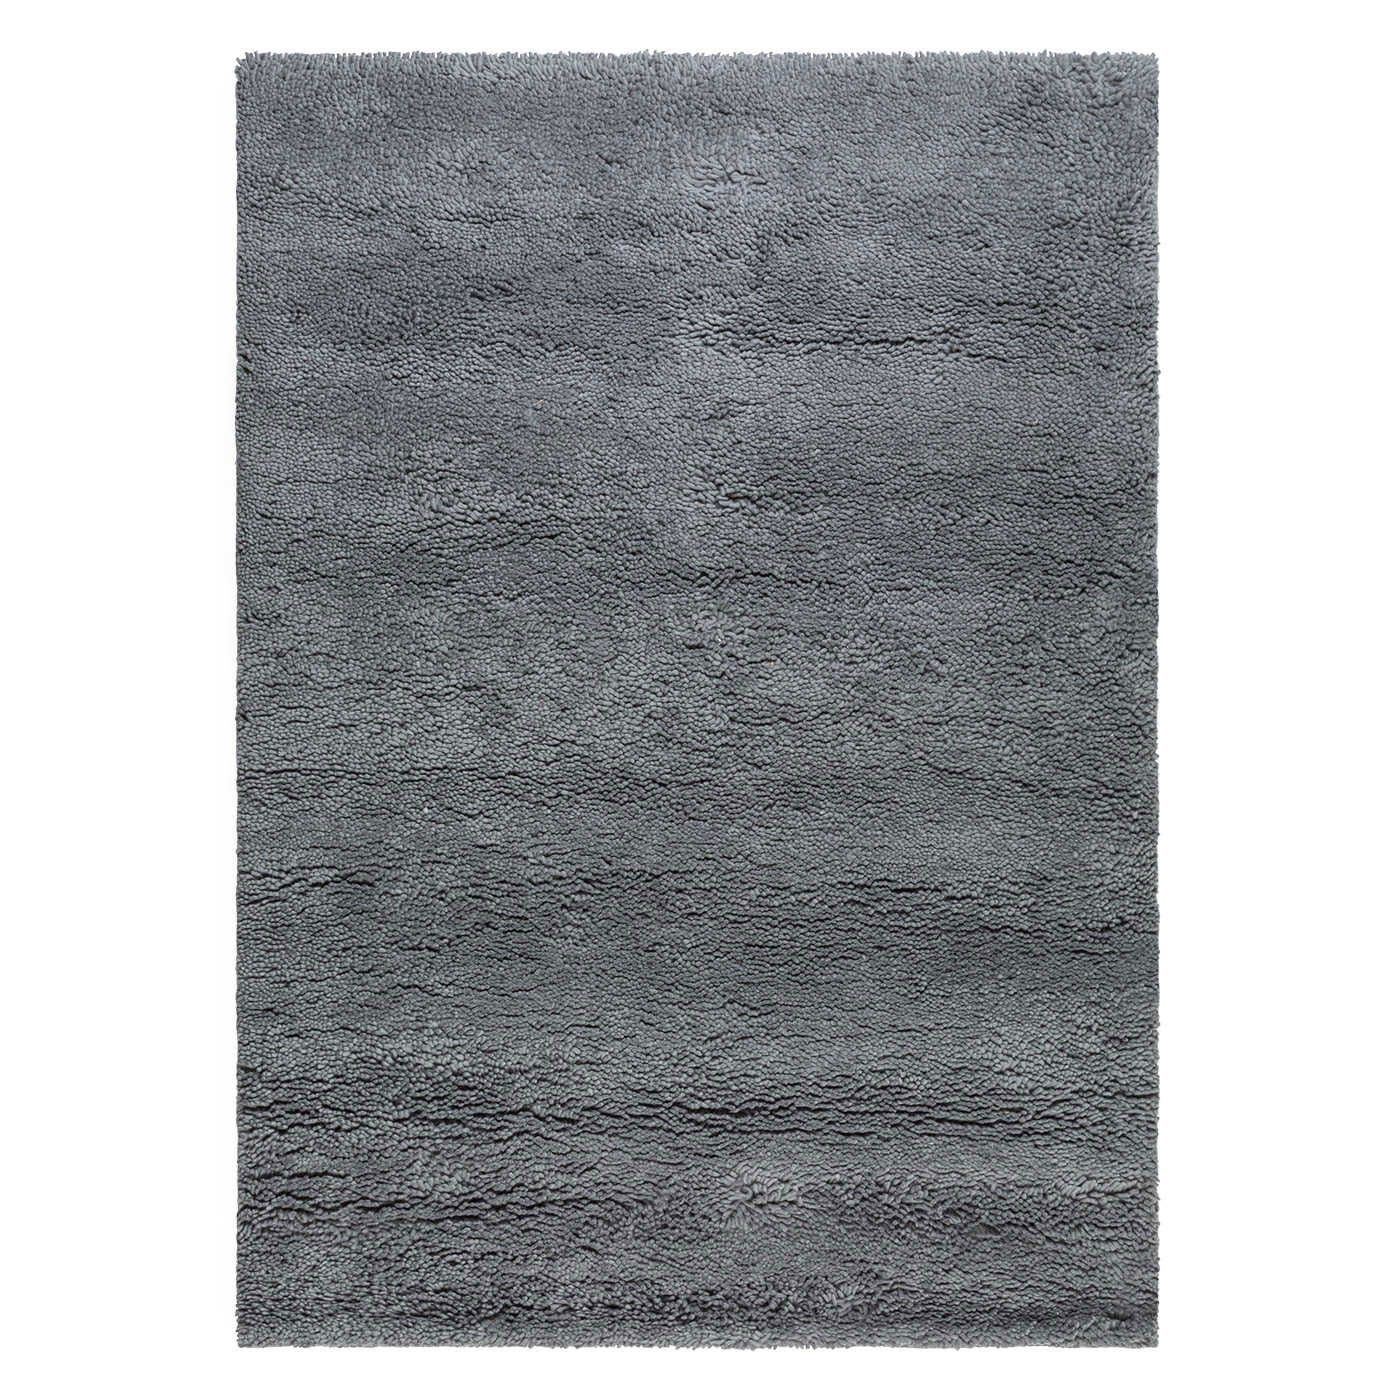 Jabara Rug Charcoal